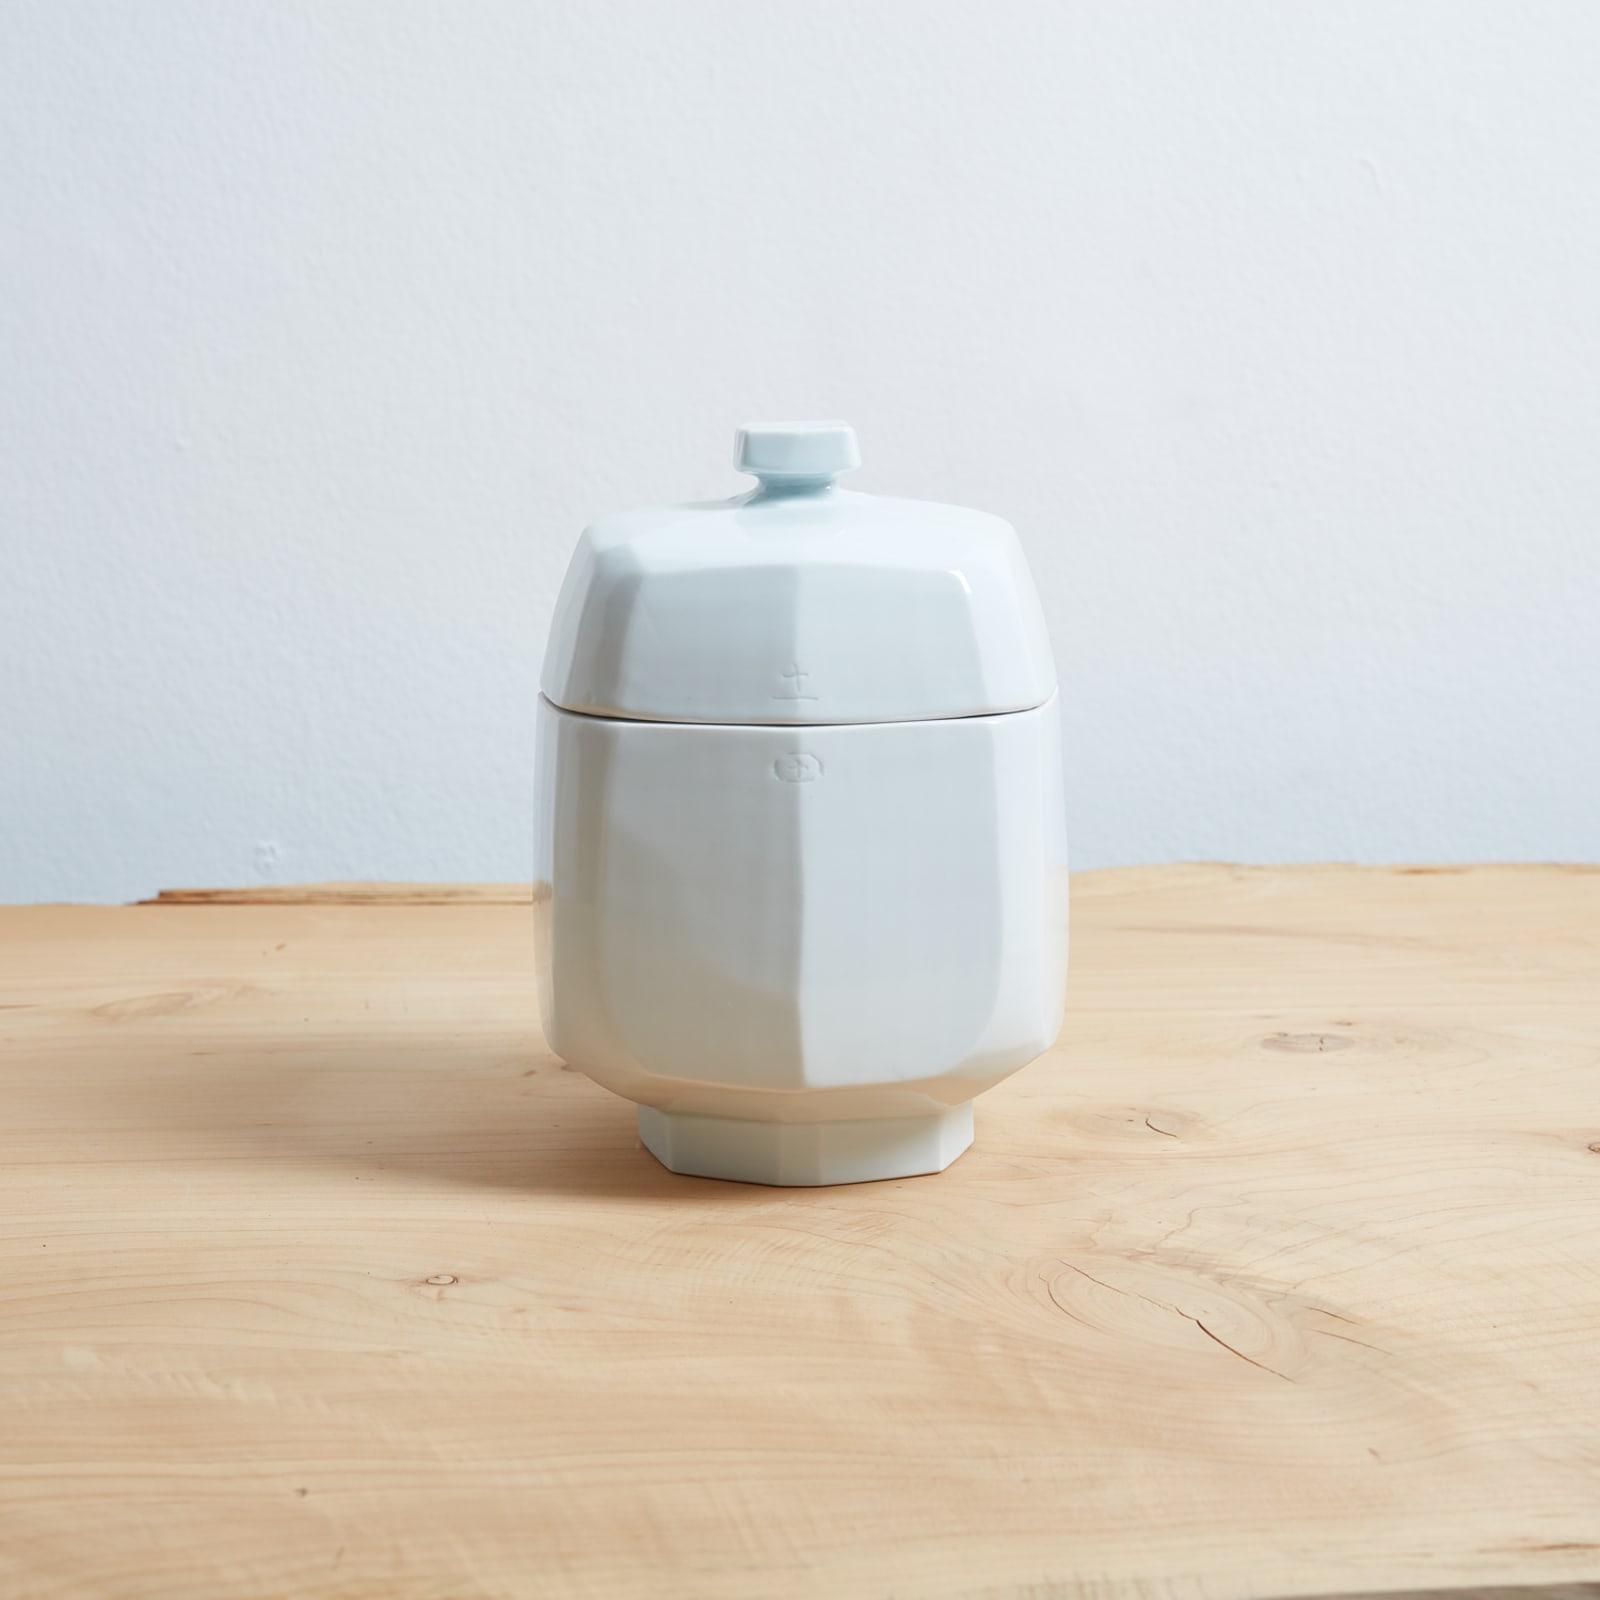 Kim Yikyung  Hap , 2016  White porcelain  23 x 17 x 17 cm